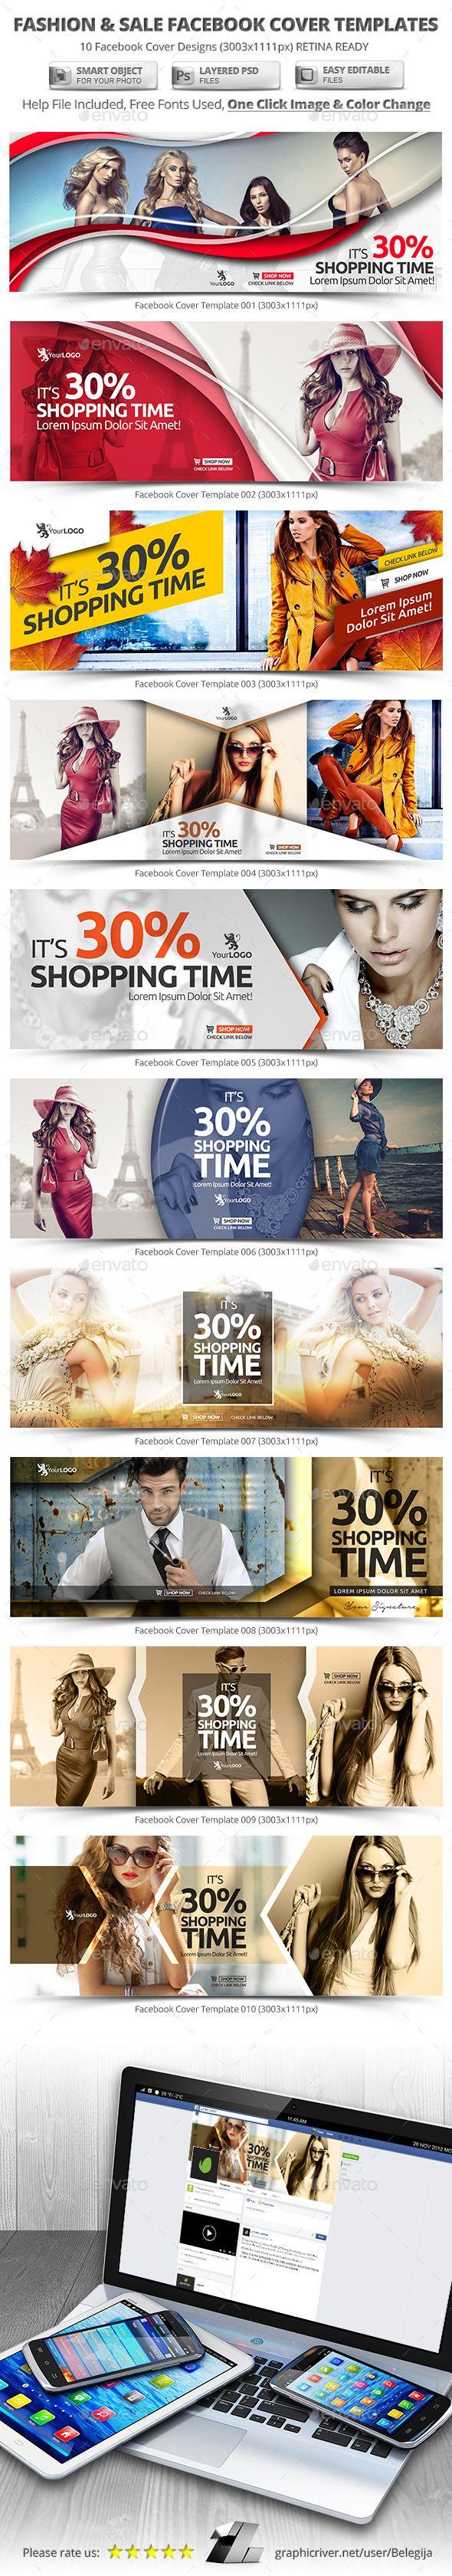 10 Fashion & Sale Facebook Cover Templates #design #psd Download: http://graphicriver.net/item/10-fashion-sale-facebook-cover-templates/12642017?ref=ksioks